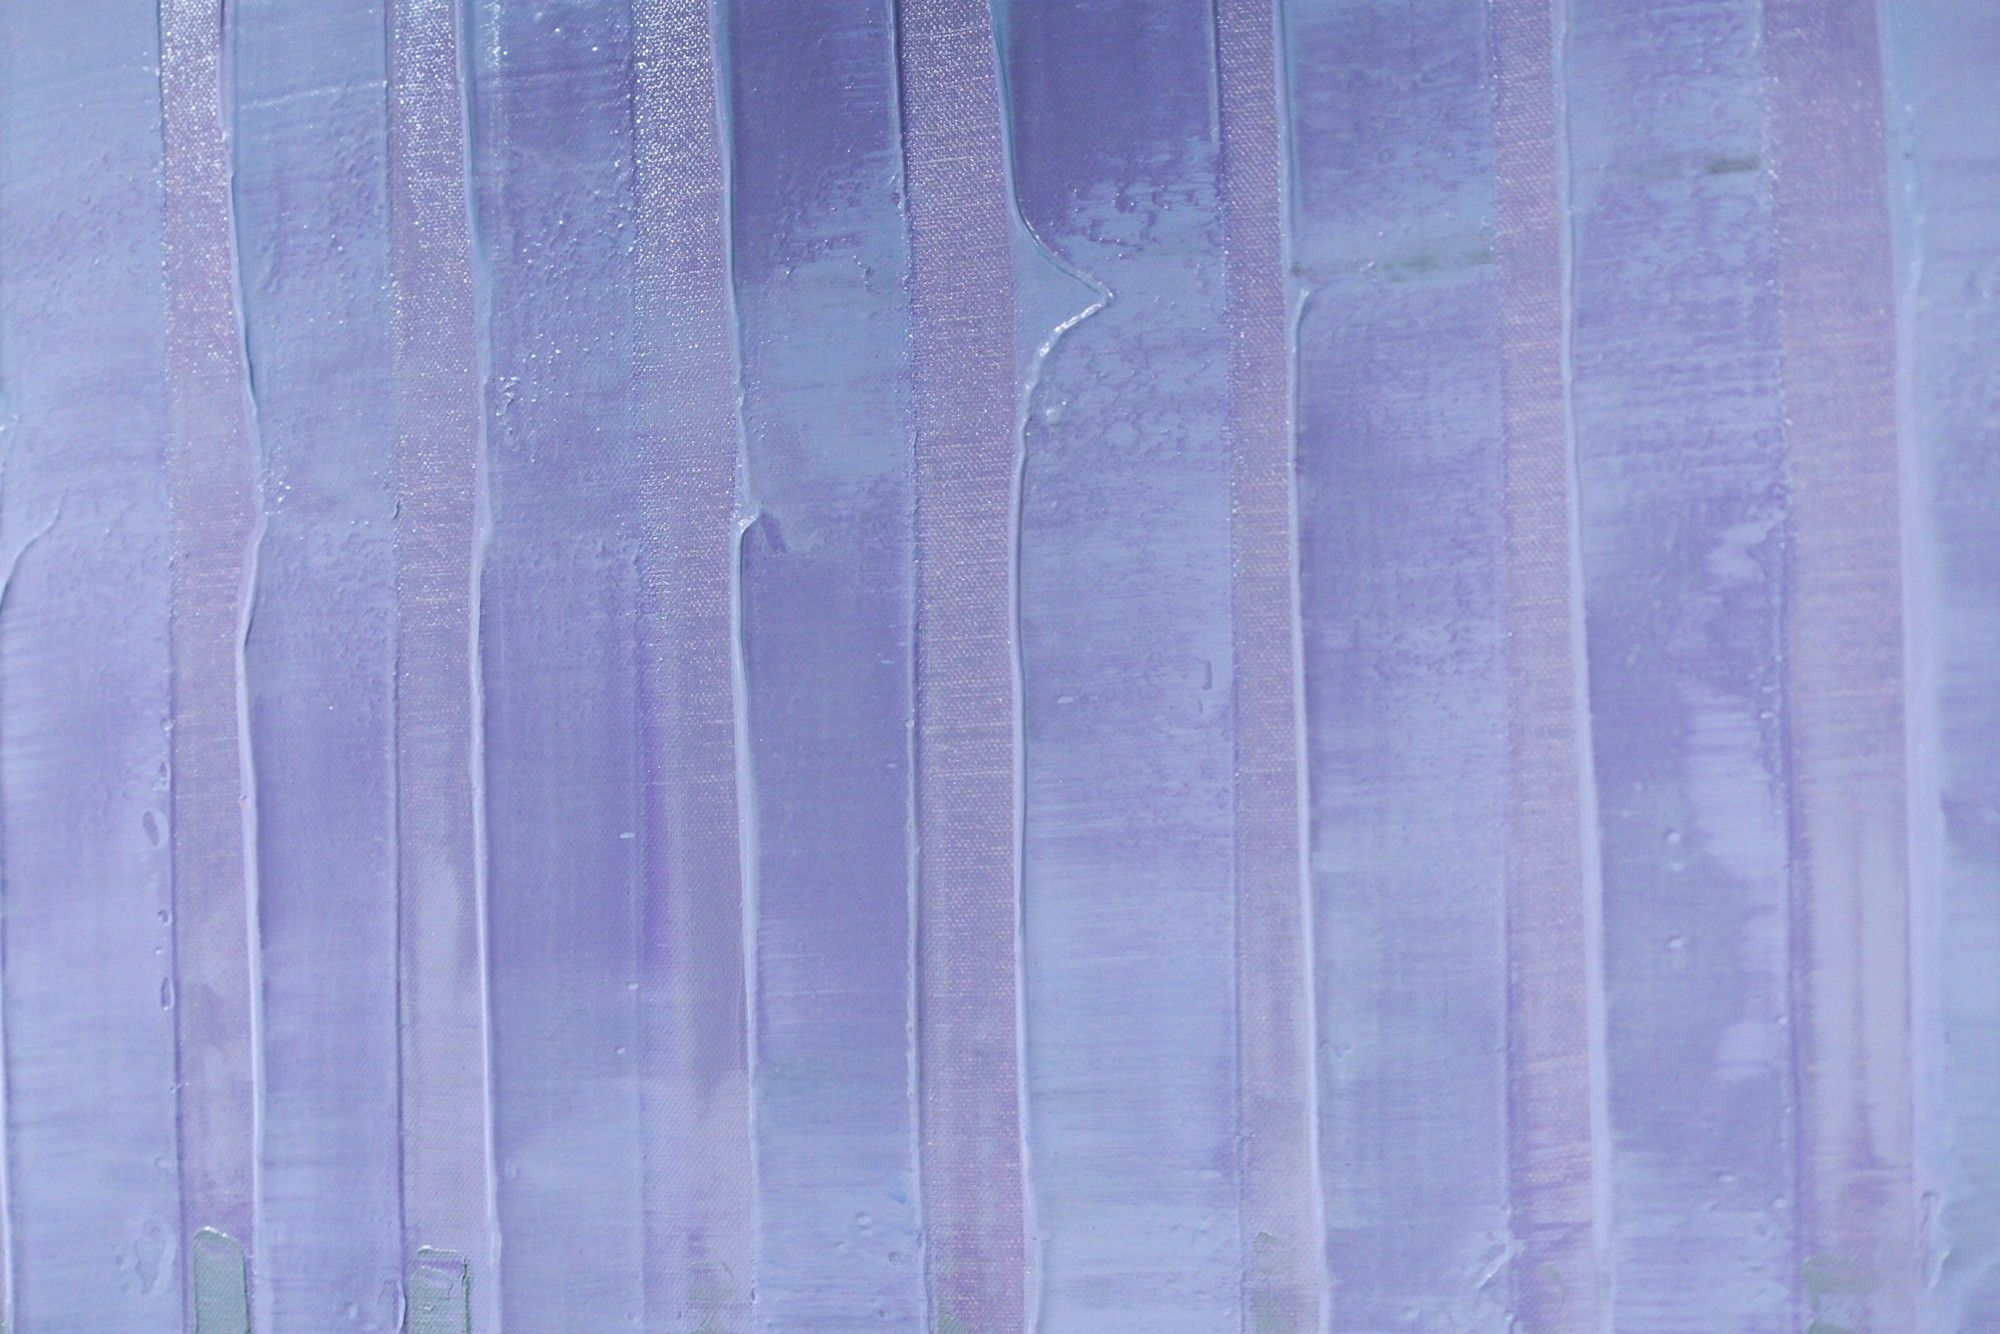 Pink November | Malerei von Lali Torma | Acryl auf Leinwand, abstrakt, Detail 4